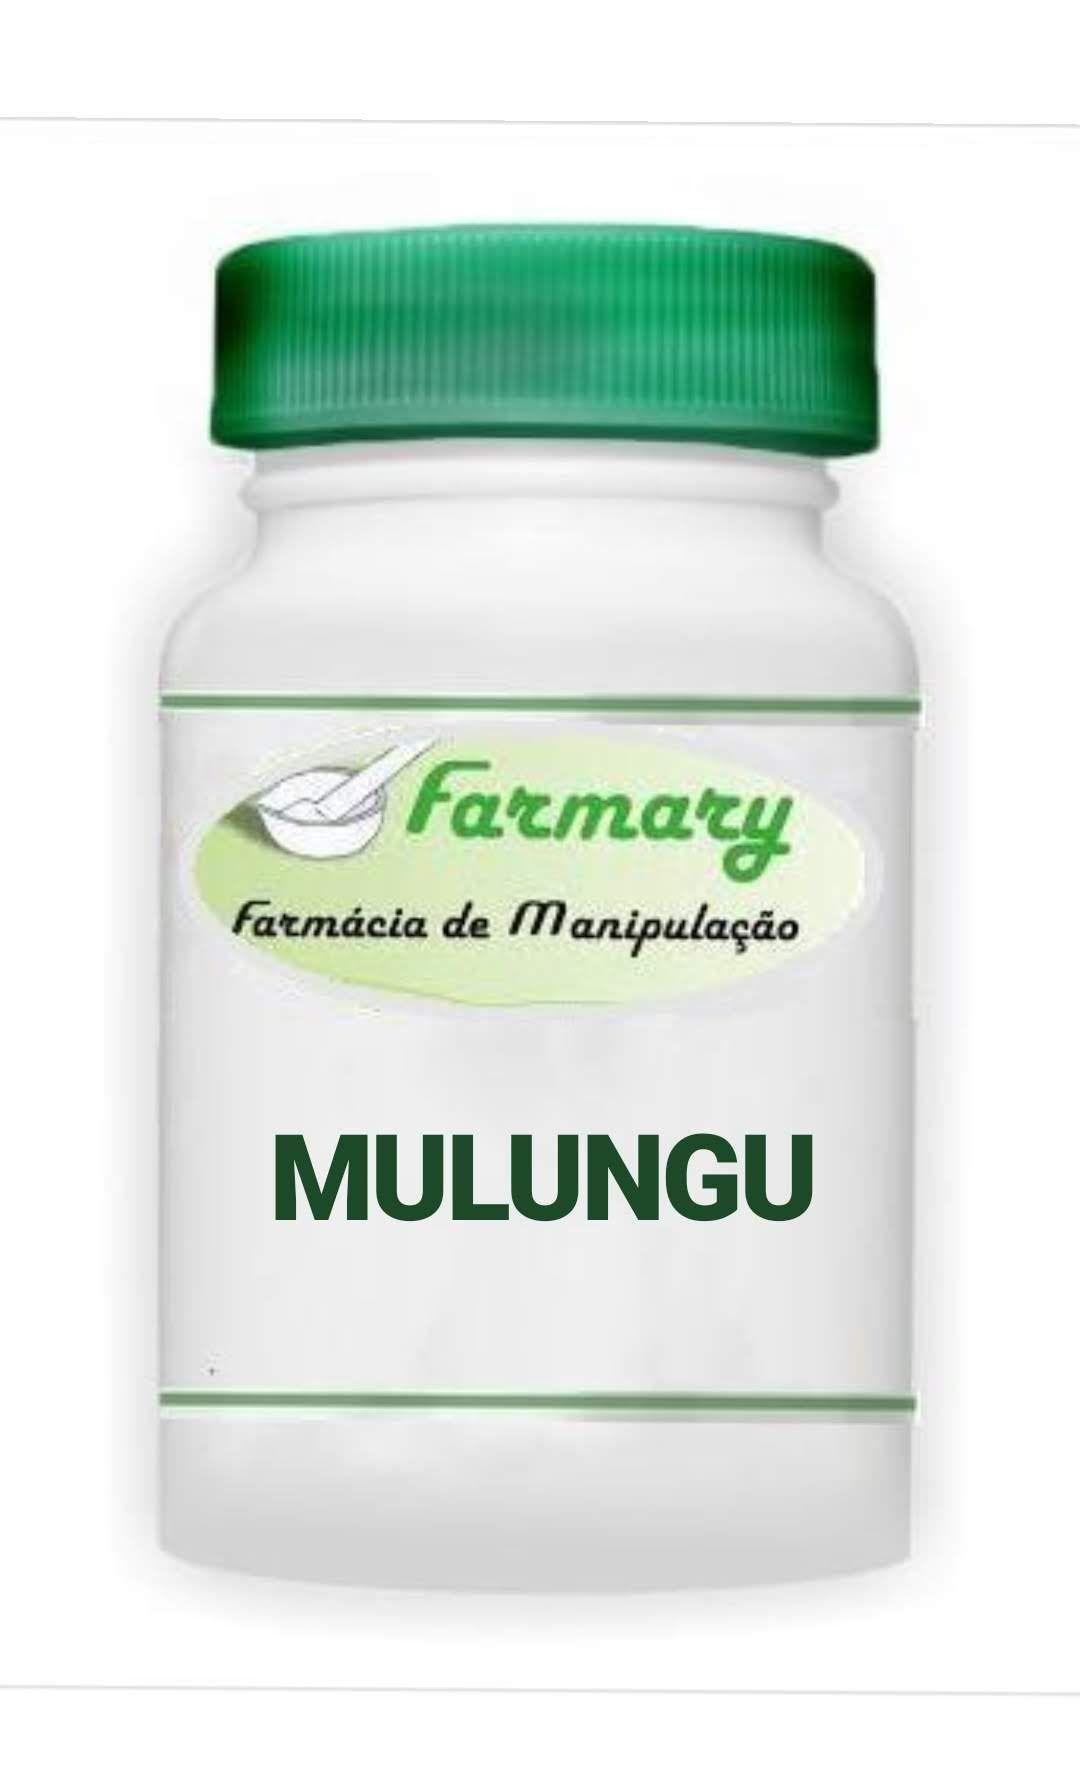 MULUNGU